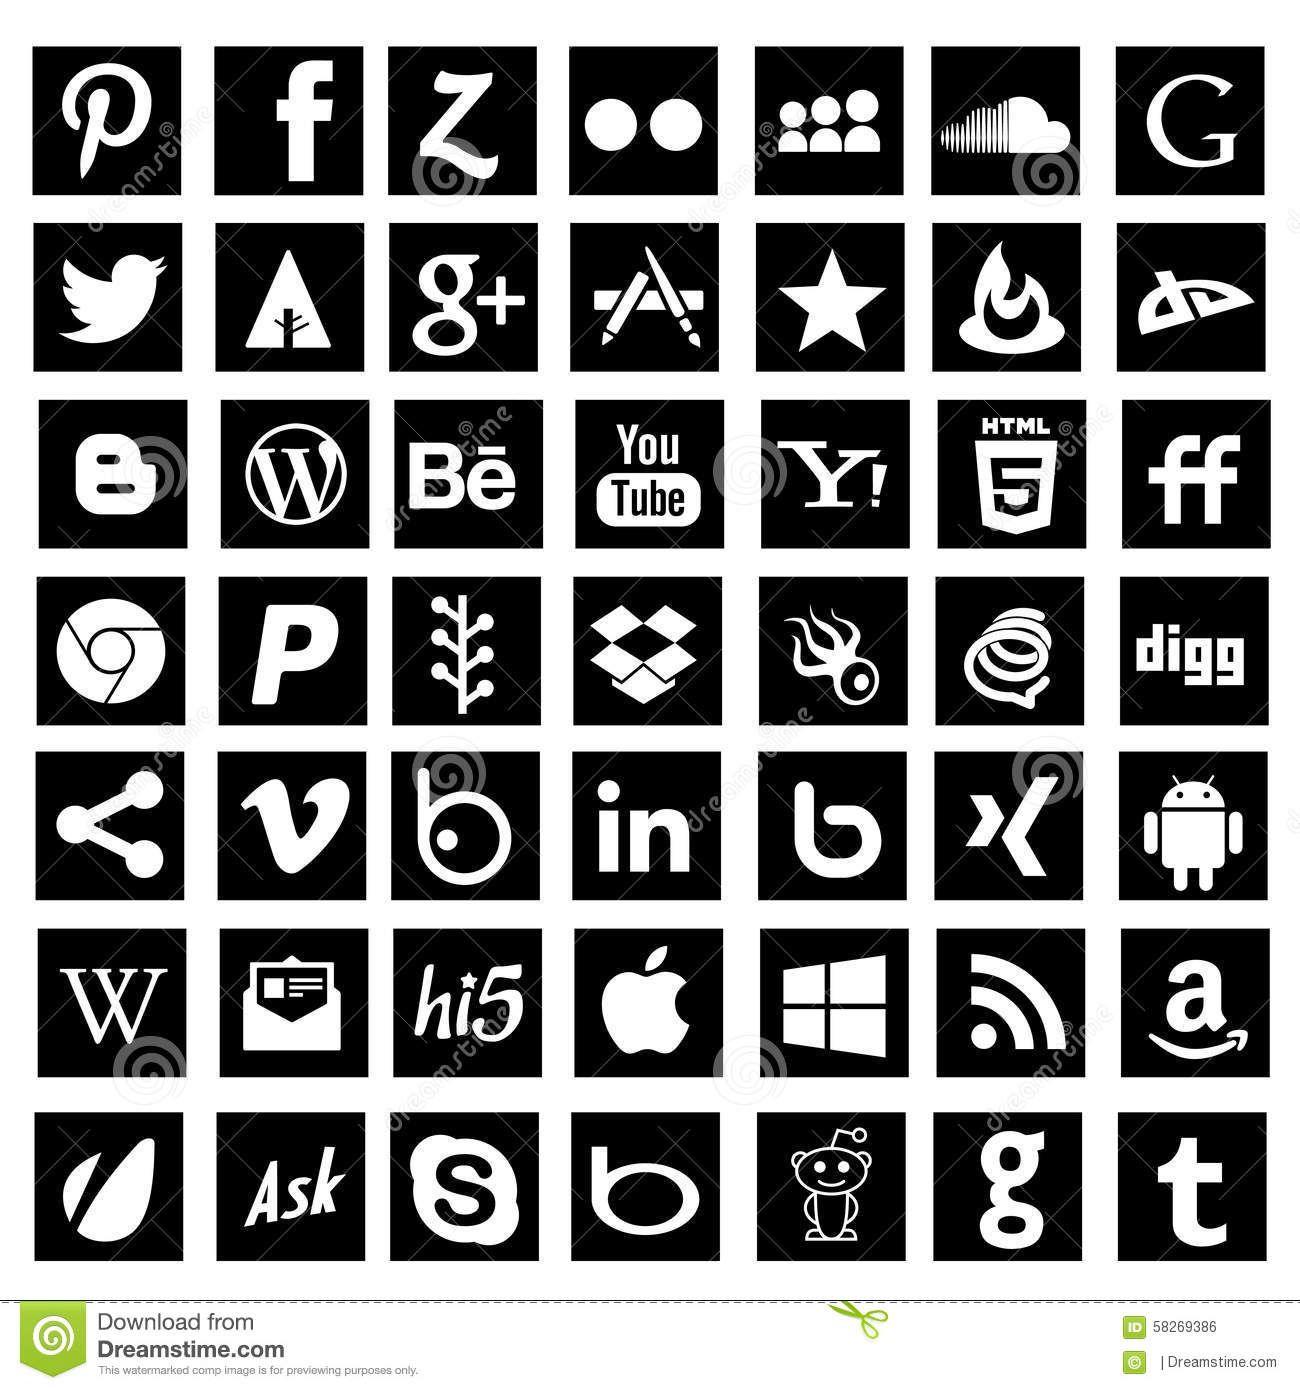 Crossword Puzzle Gallery Seotud Kujutis Illuminated Pinterest Of Jeweler S Lens On Jymba